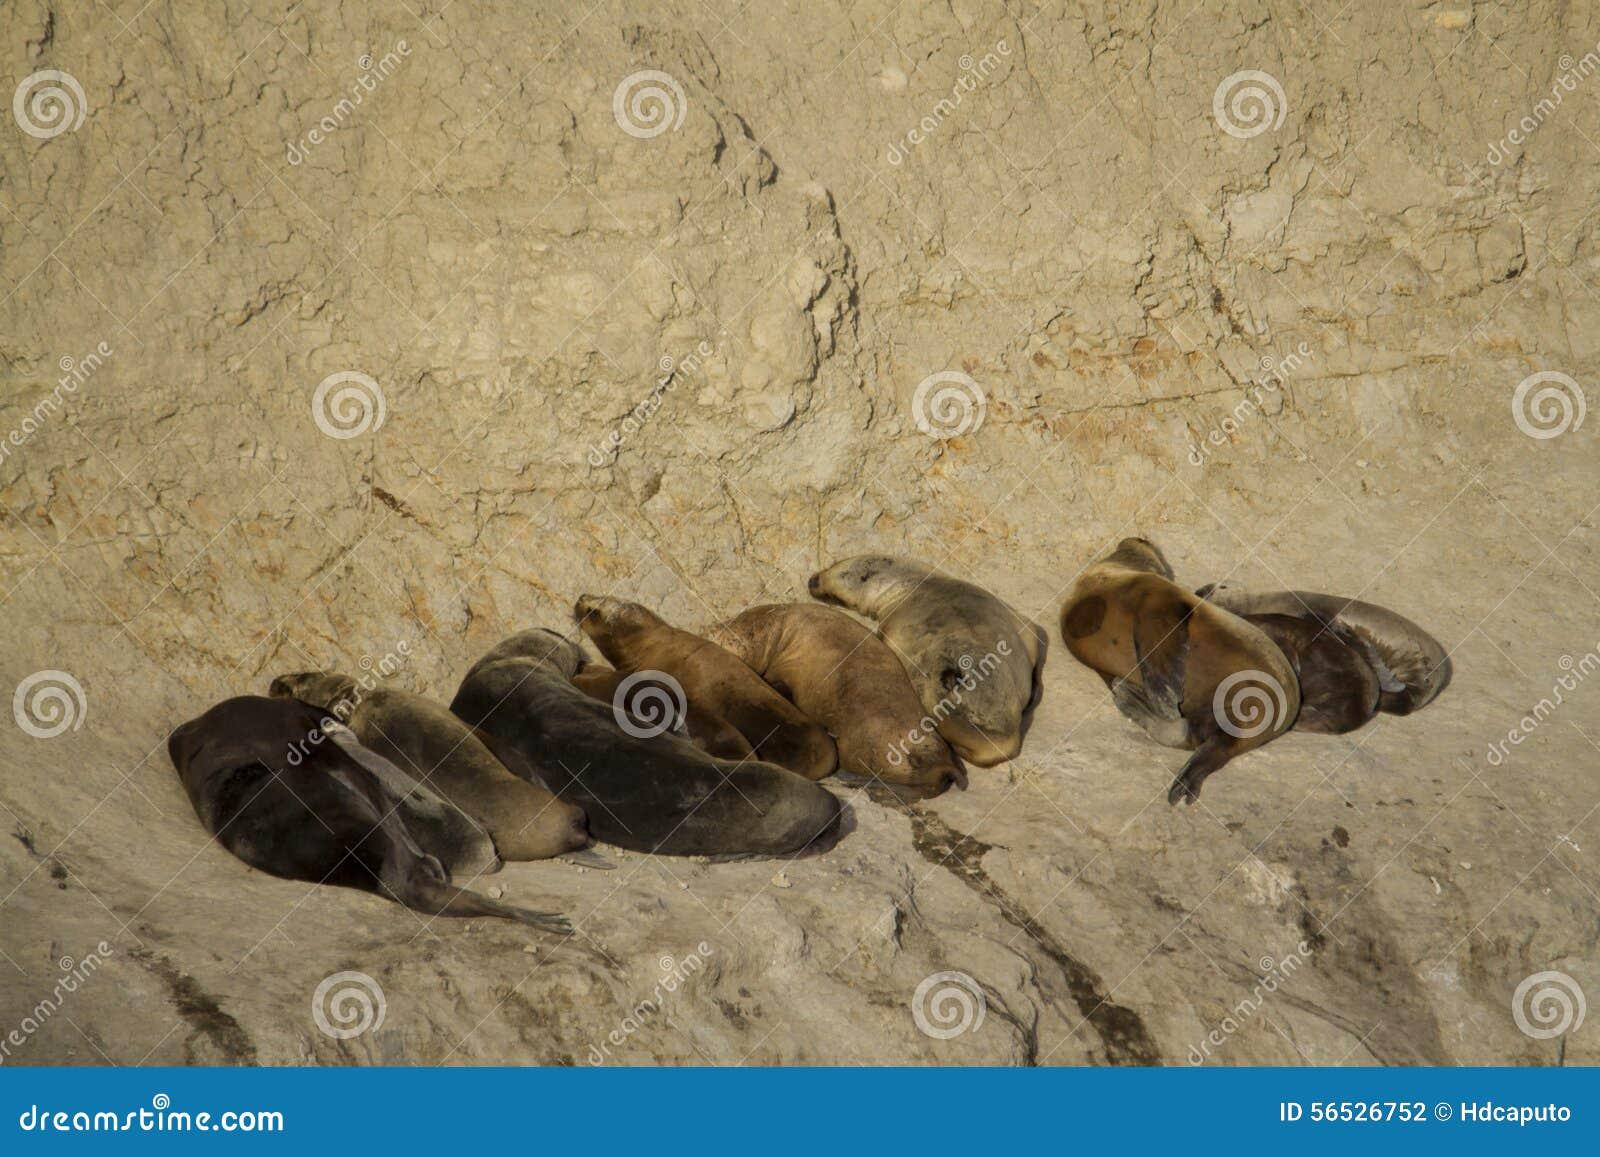 Sea lion colony in south america